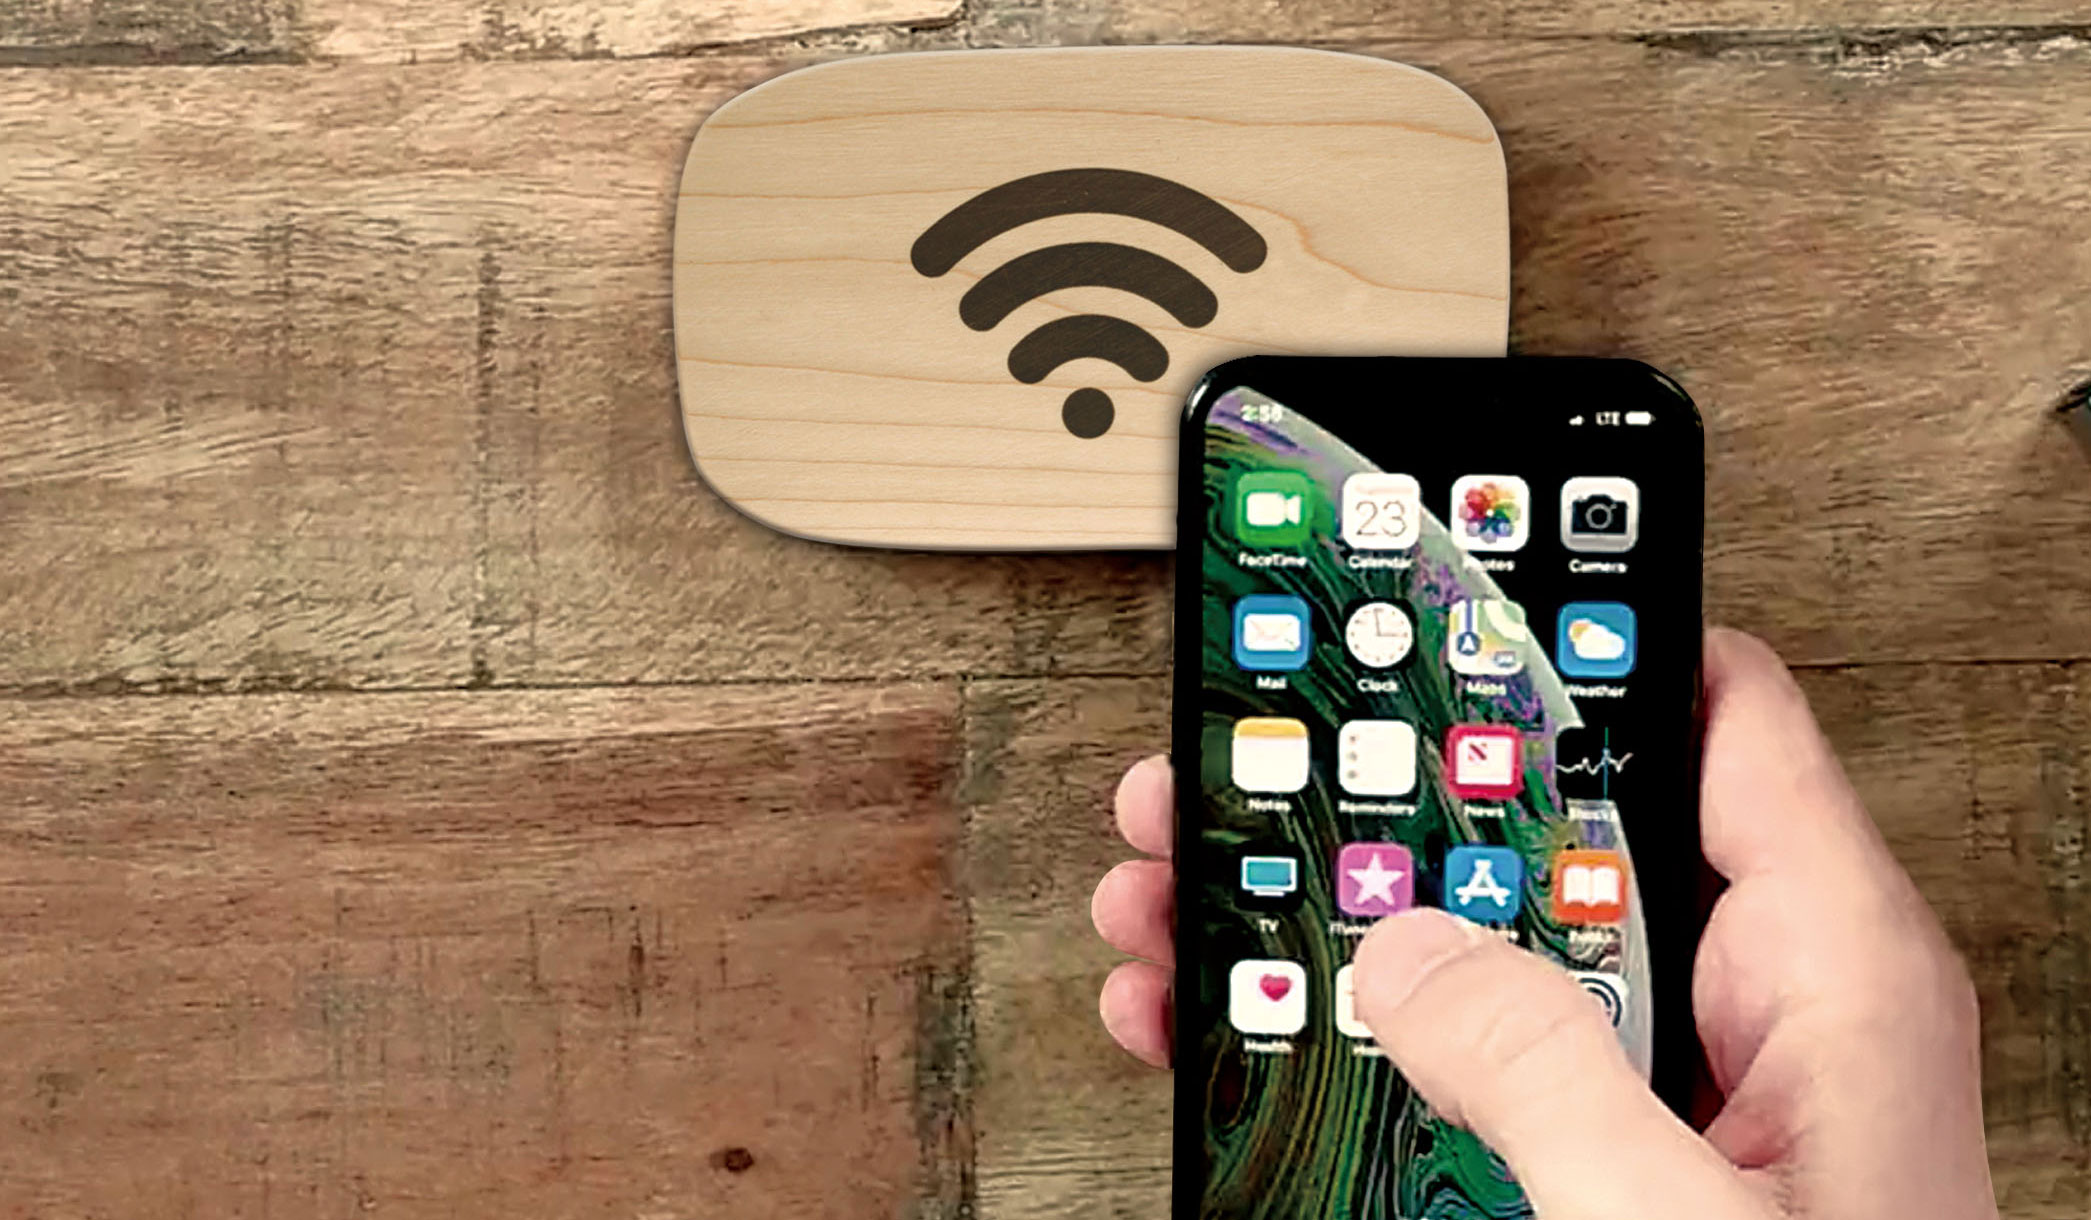 Ten One Design|スマホをかざすだけでWi-Fi接続できる画期的なデバイス